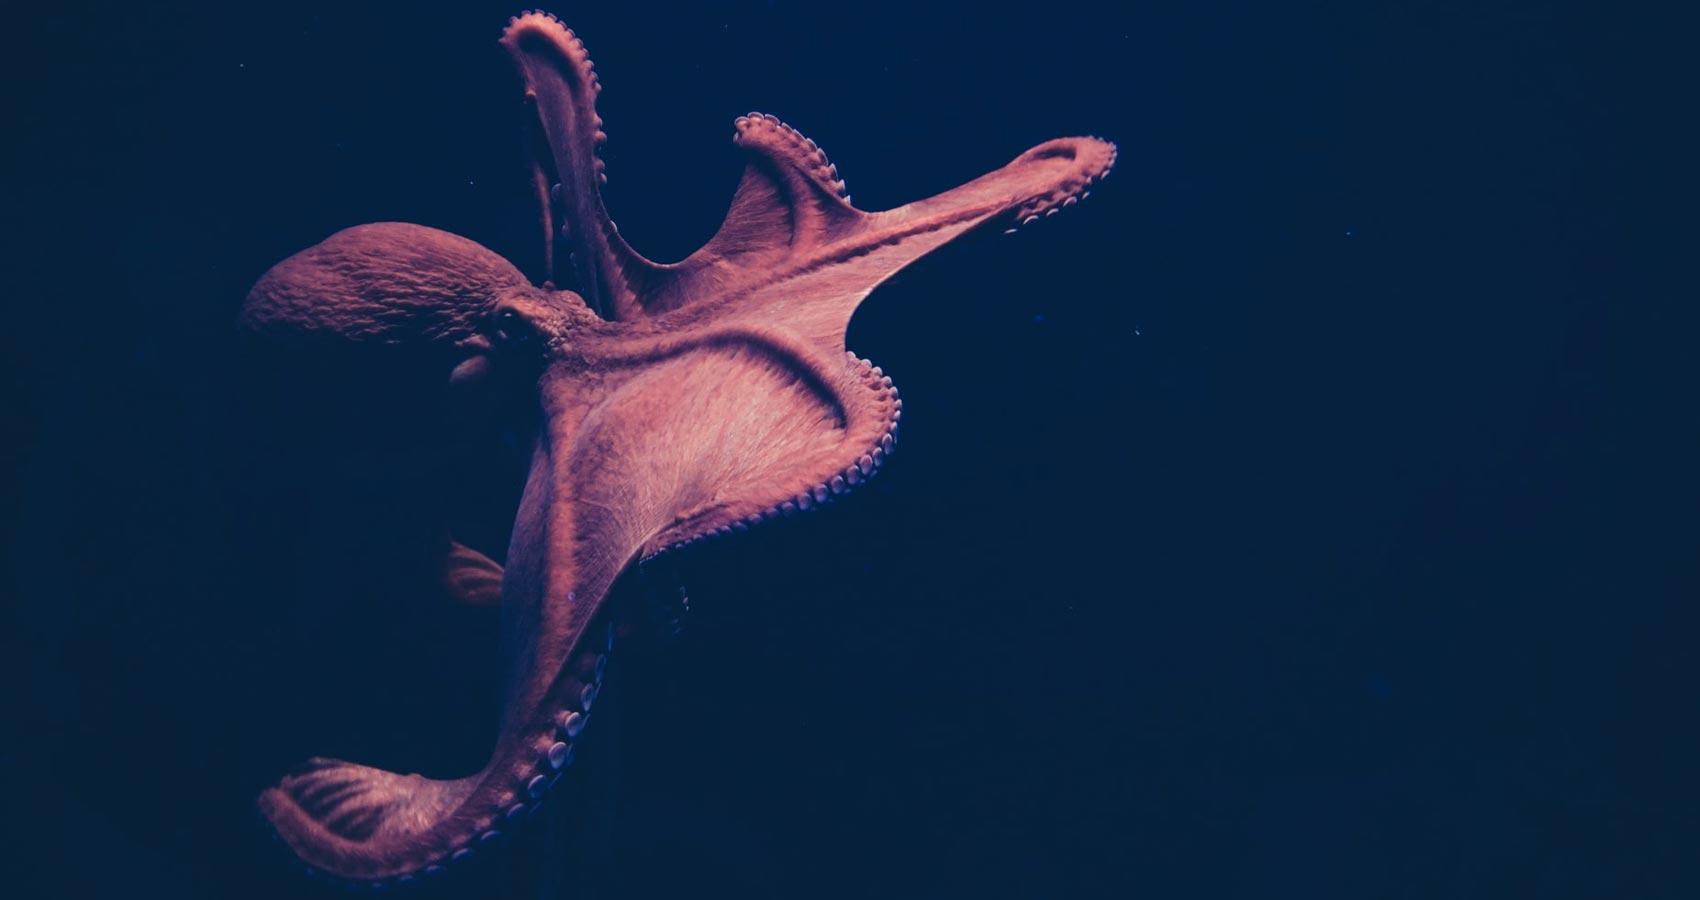 Octopus Damsel, a poem by Milagros Vilaplana at Spillwords.com